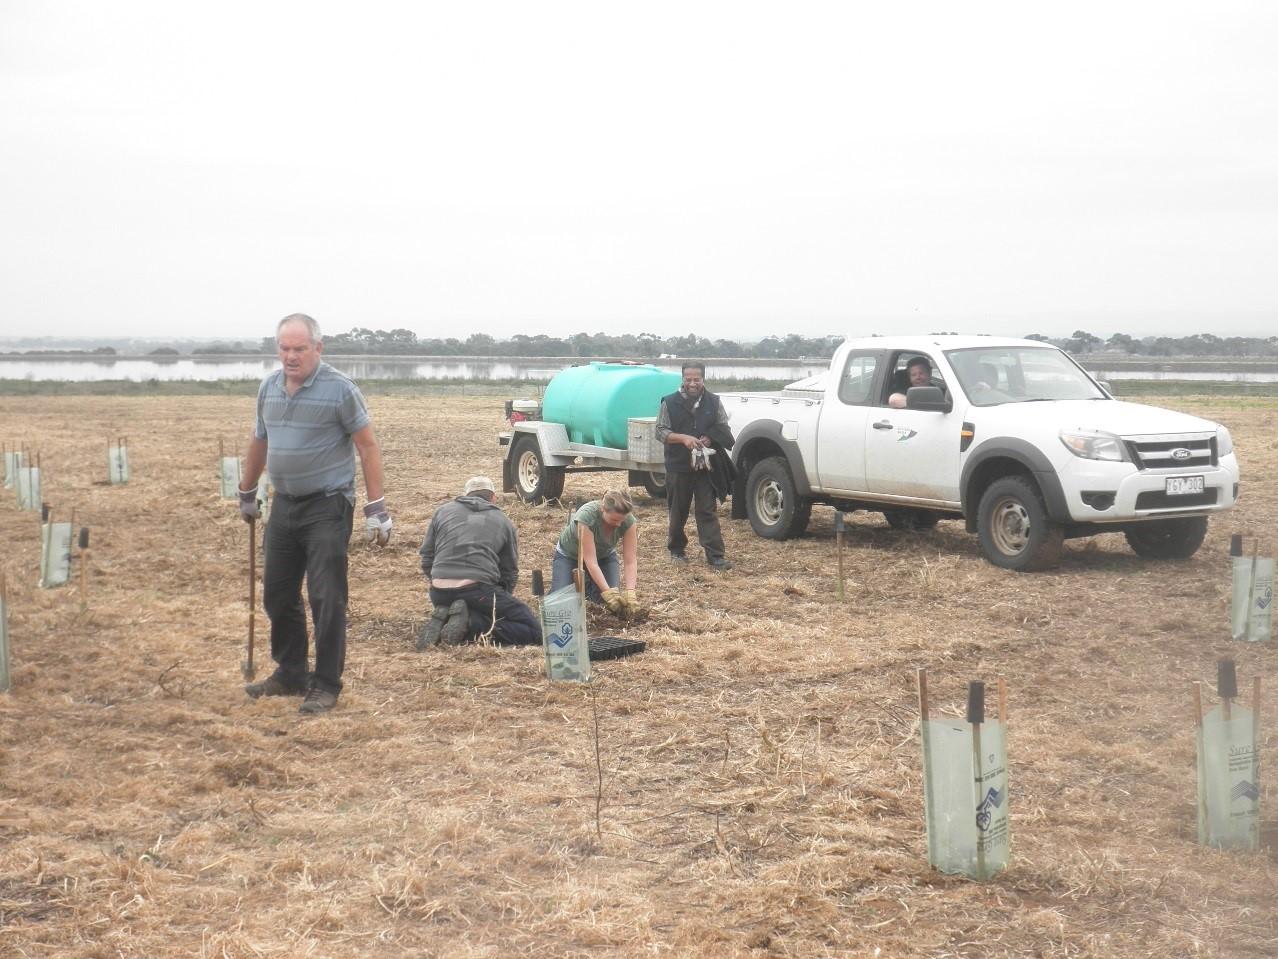 William Rajendram of Western Water planting with volunteers